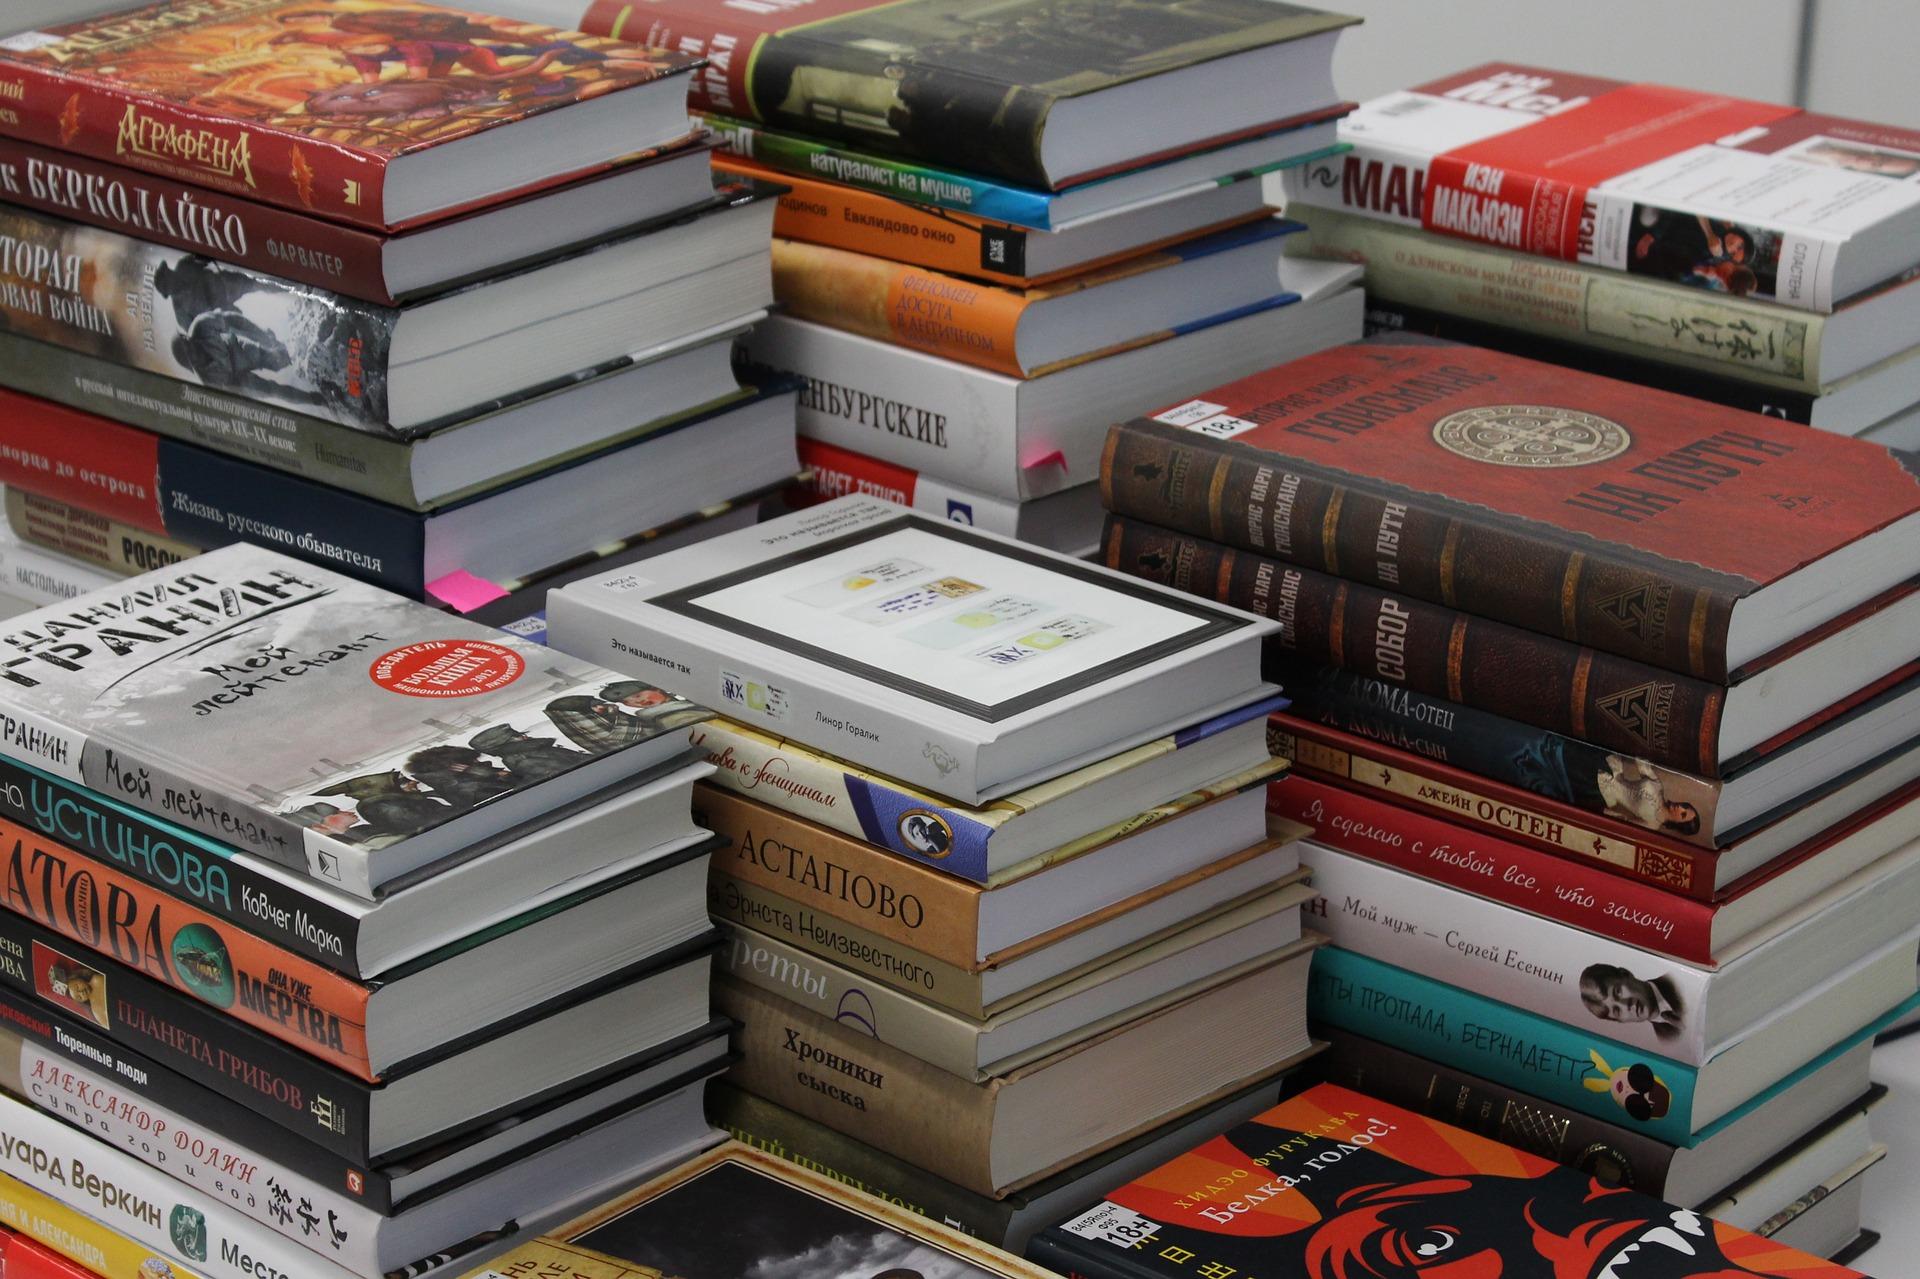 6bd4e3f2264251e0b33a_books-922321_1920.jpg